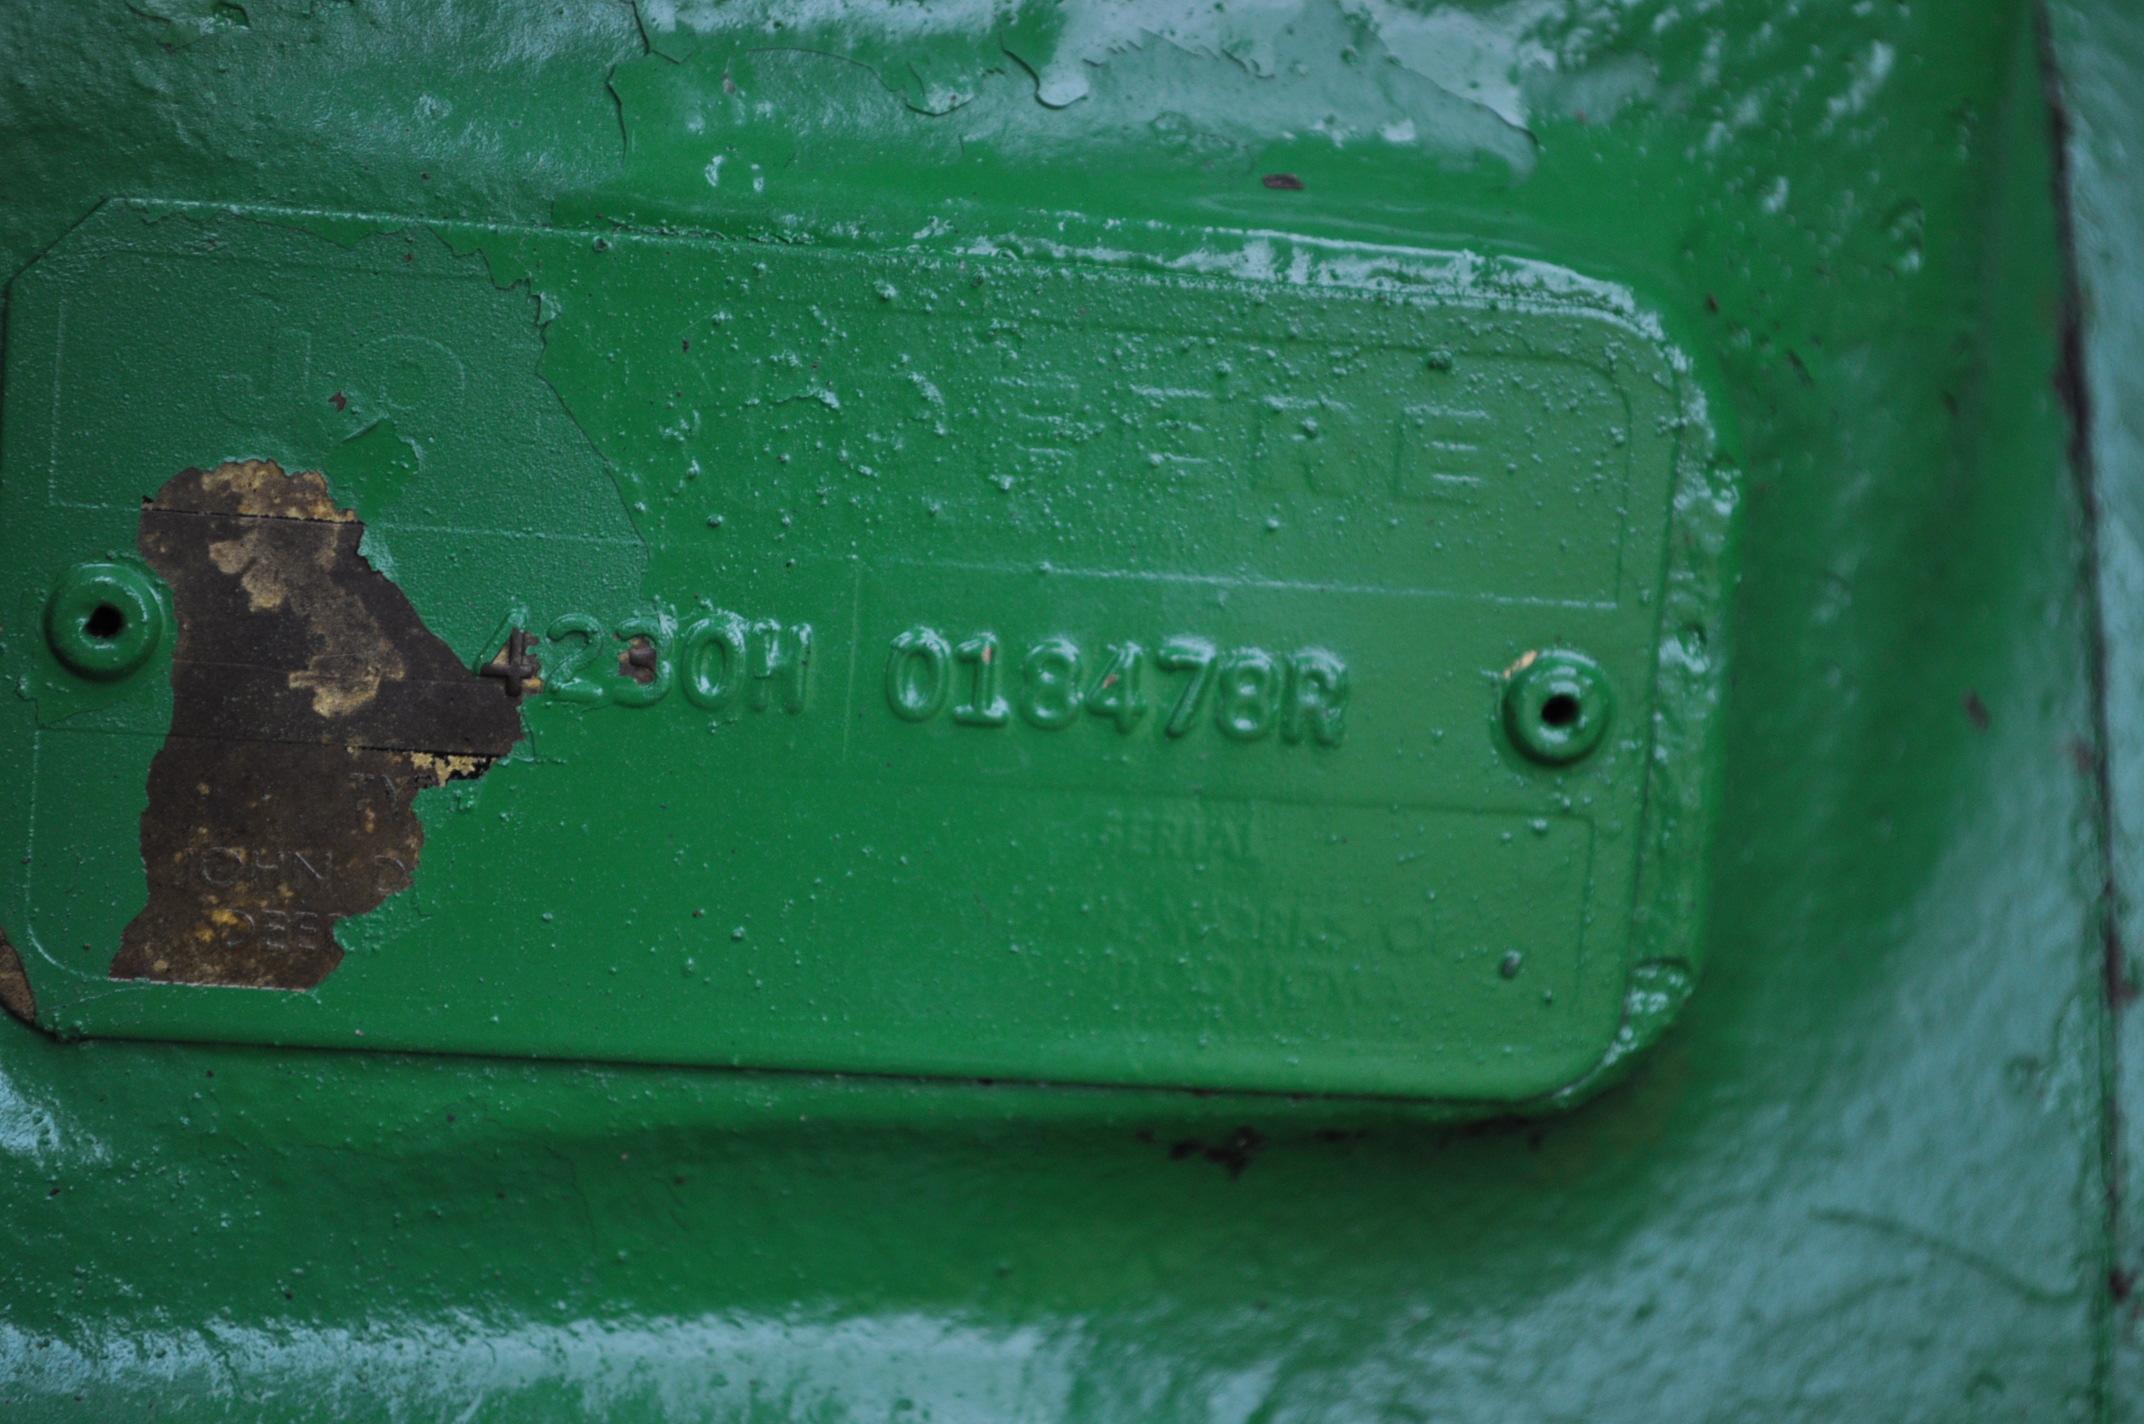 John Deere 4230 tractor, diesel, 18.4-34 hub duals, 10.00-16 front, CHA, Quad range, 2 hyd - Image 16 of 23